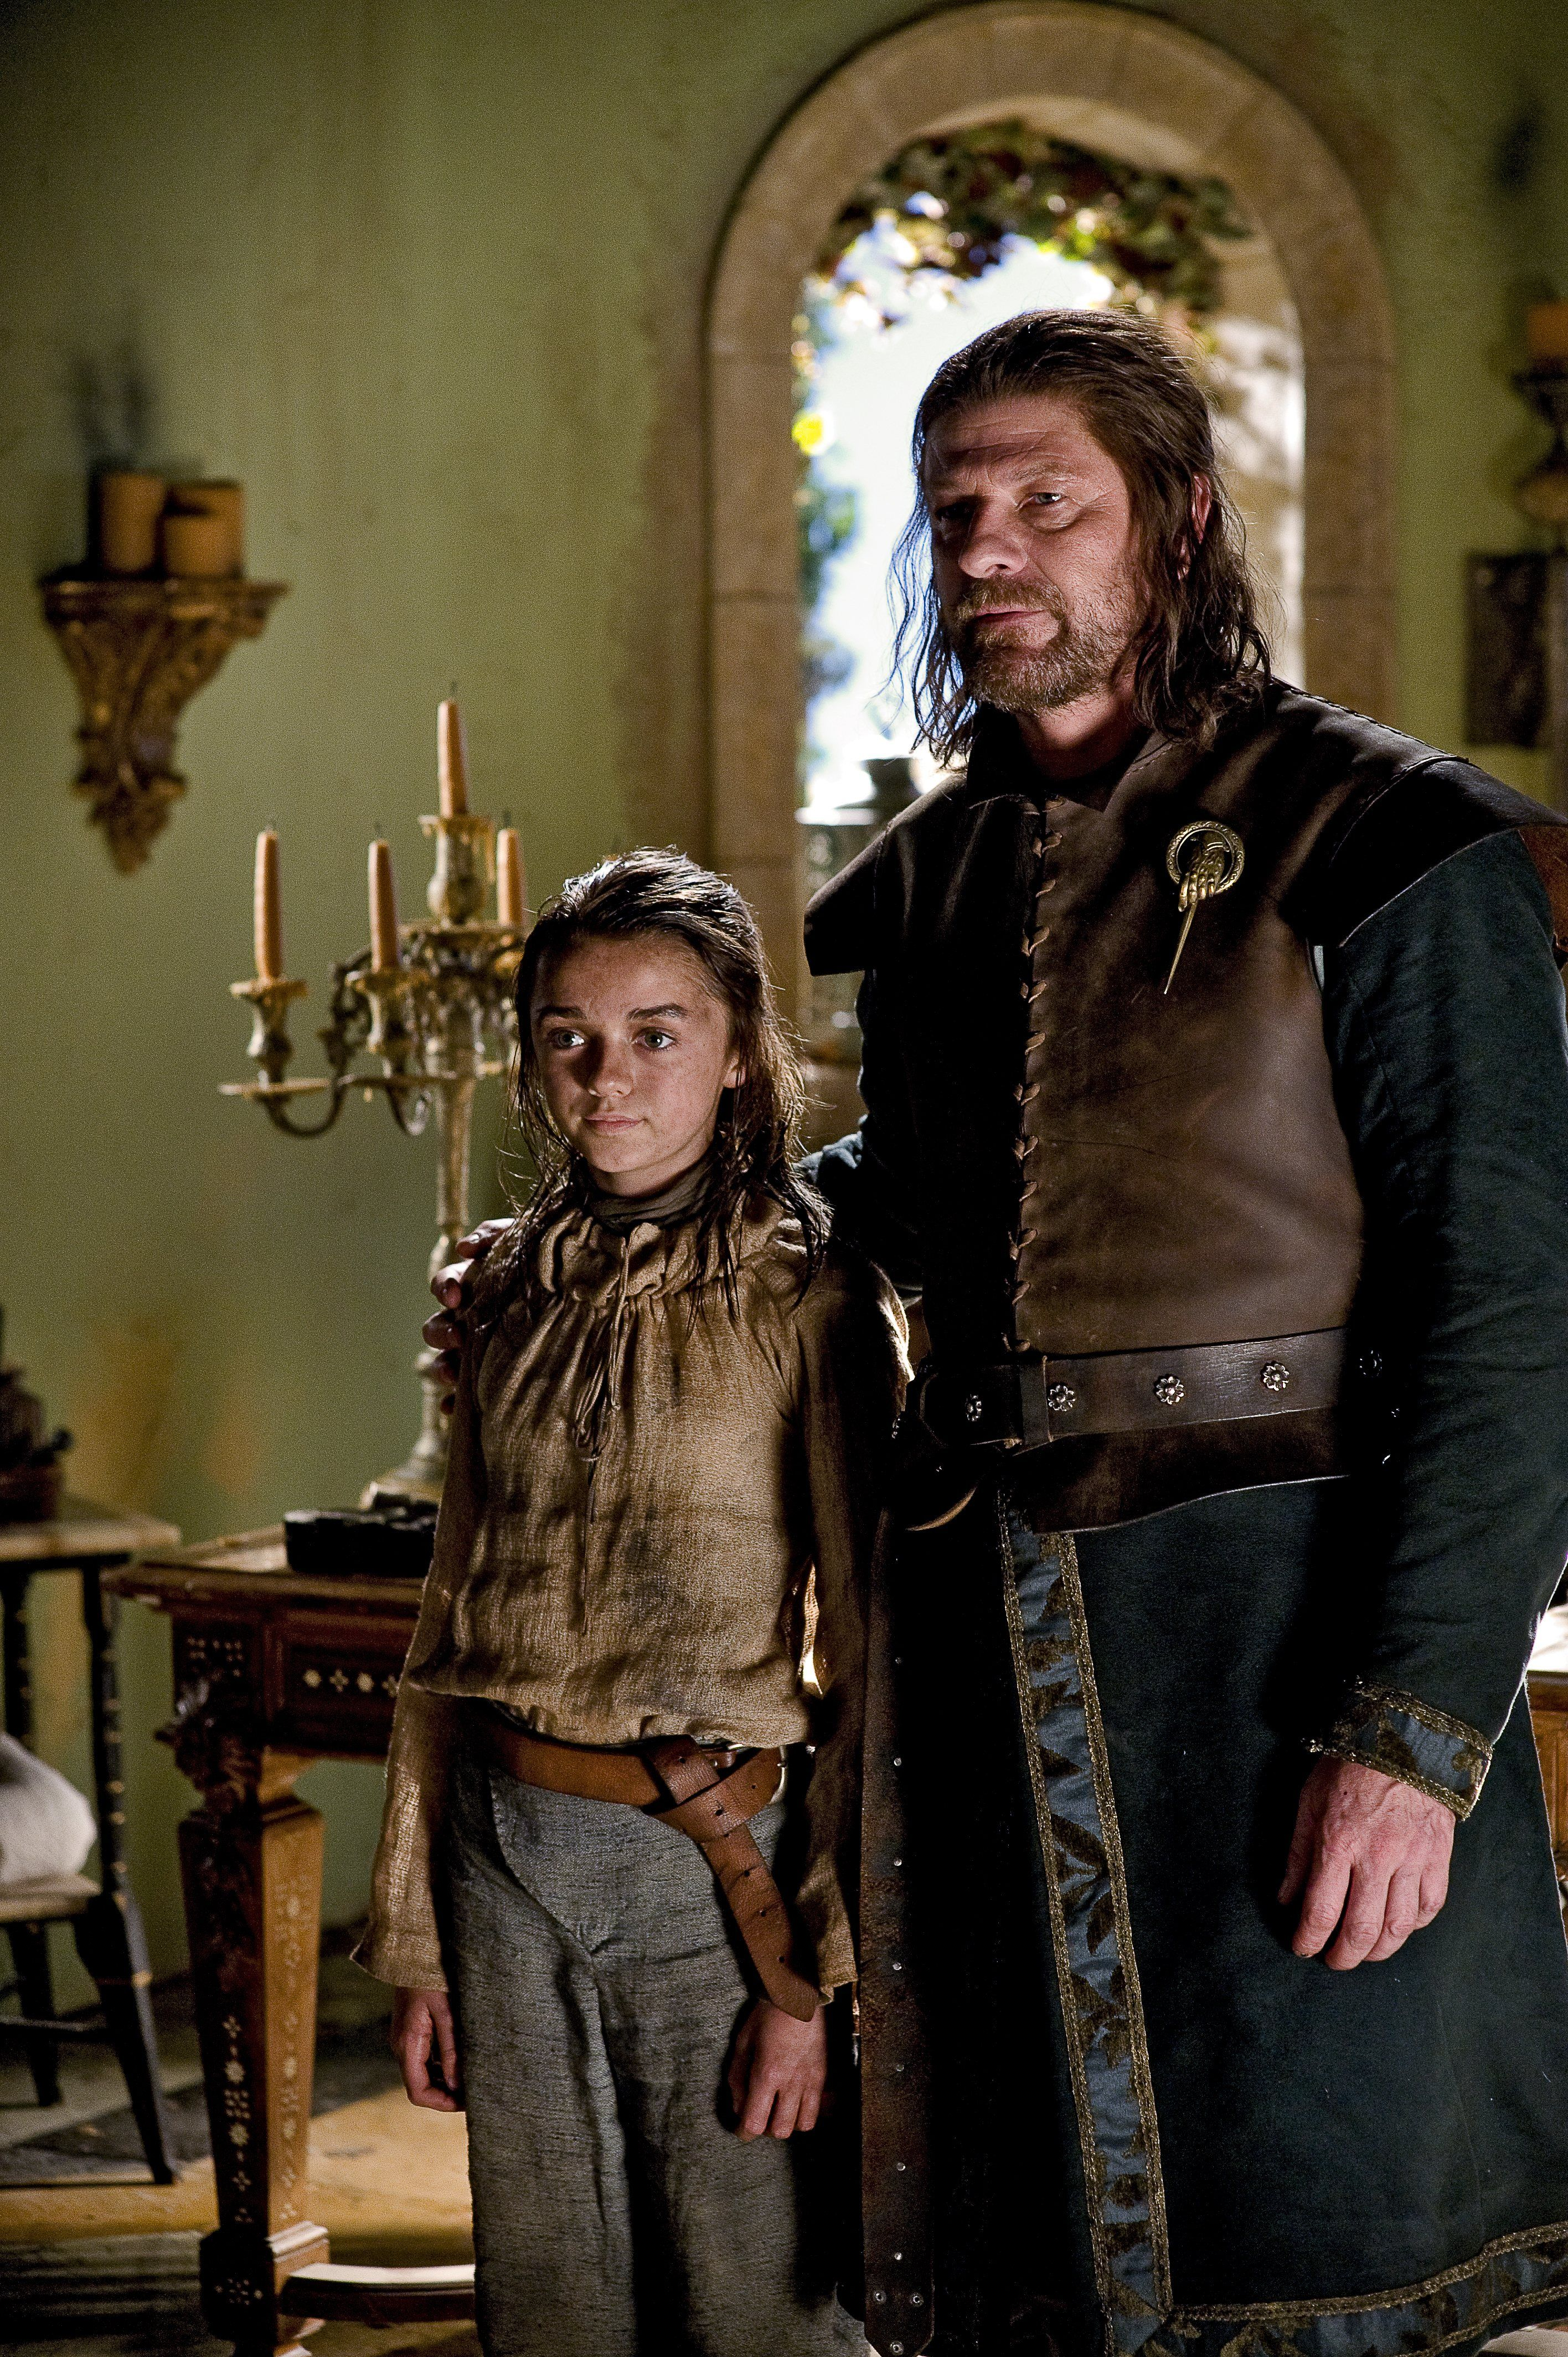 Game Of Thrones Season 1 Episode 5 Still Arya Stark In